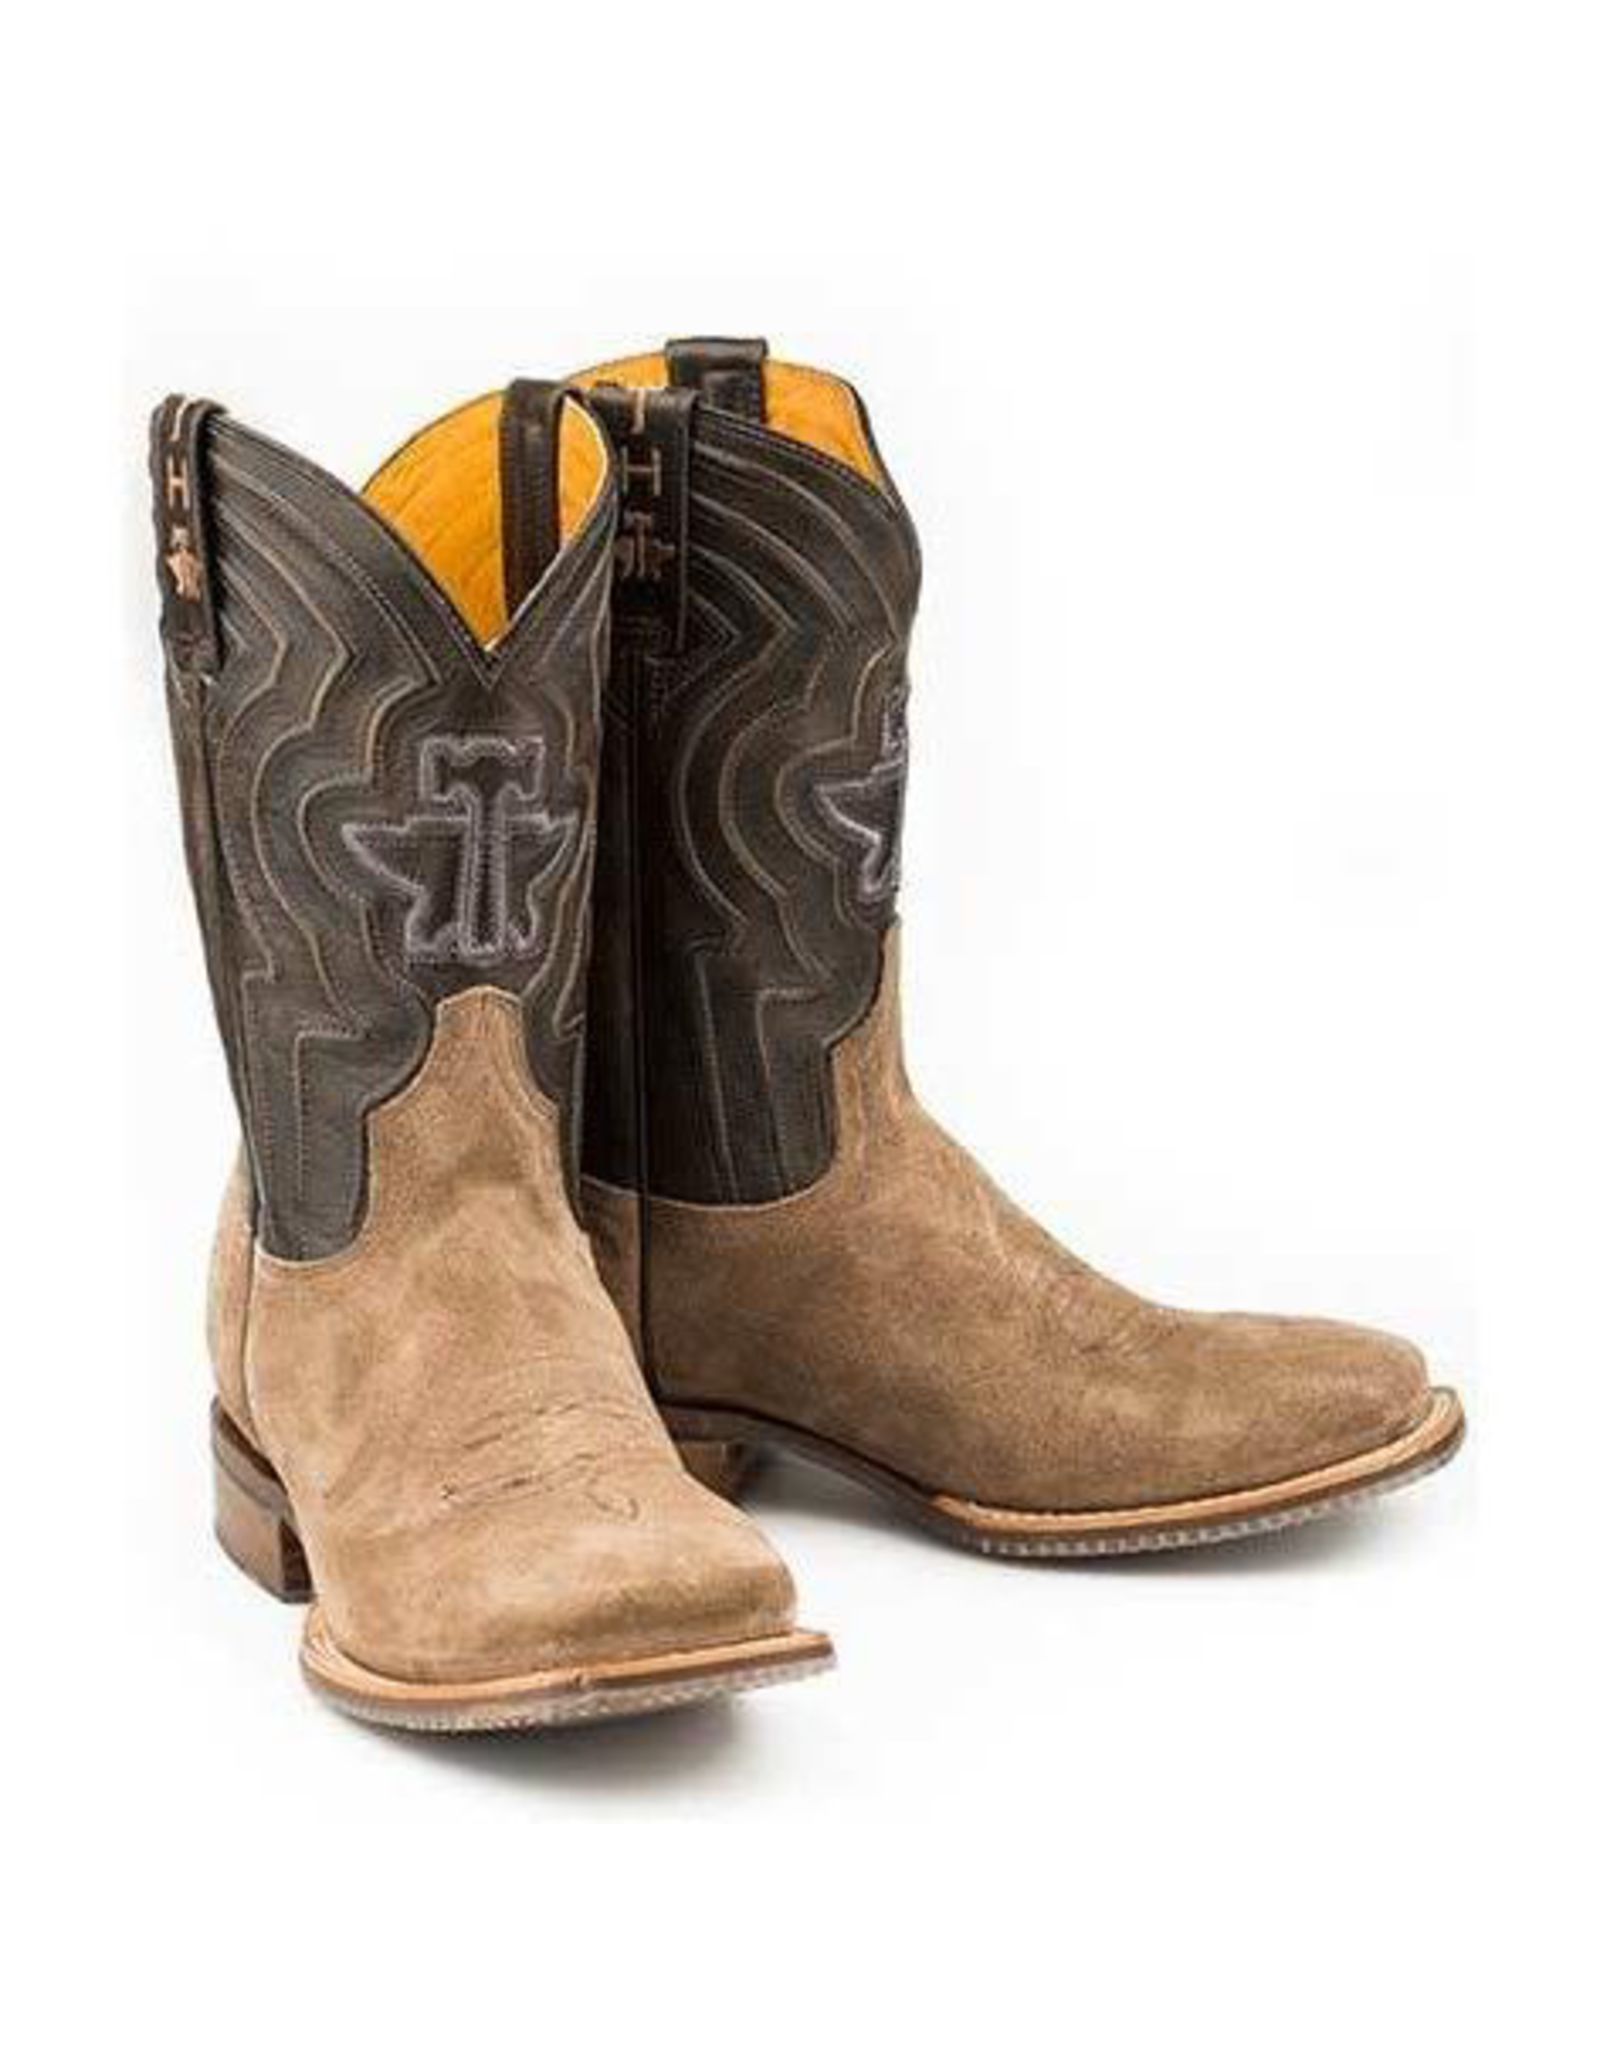 Boots-Men TIN HAUL Rough Around The Edges